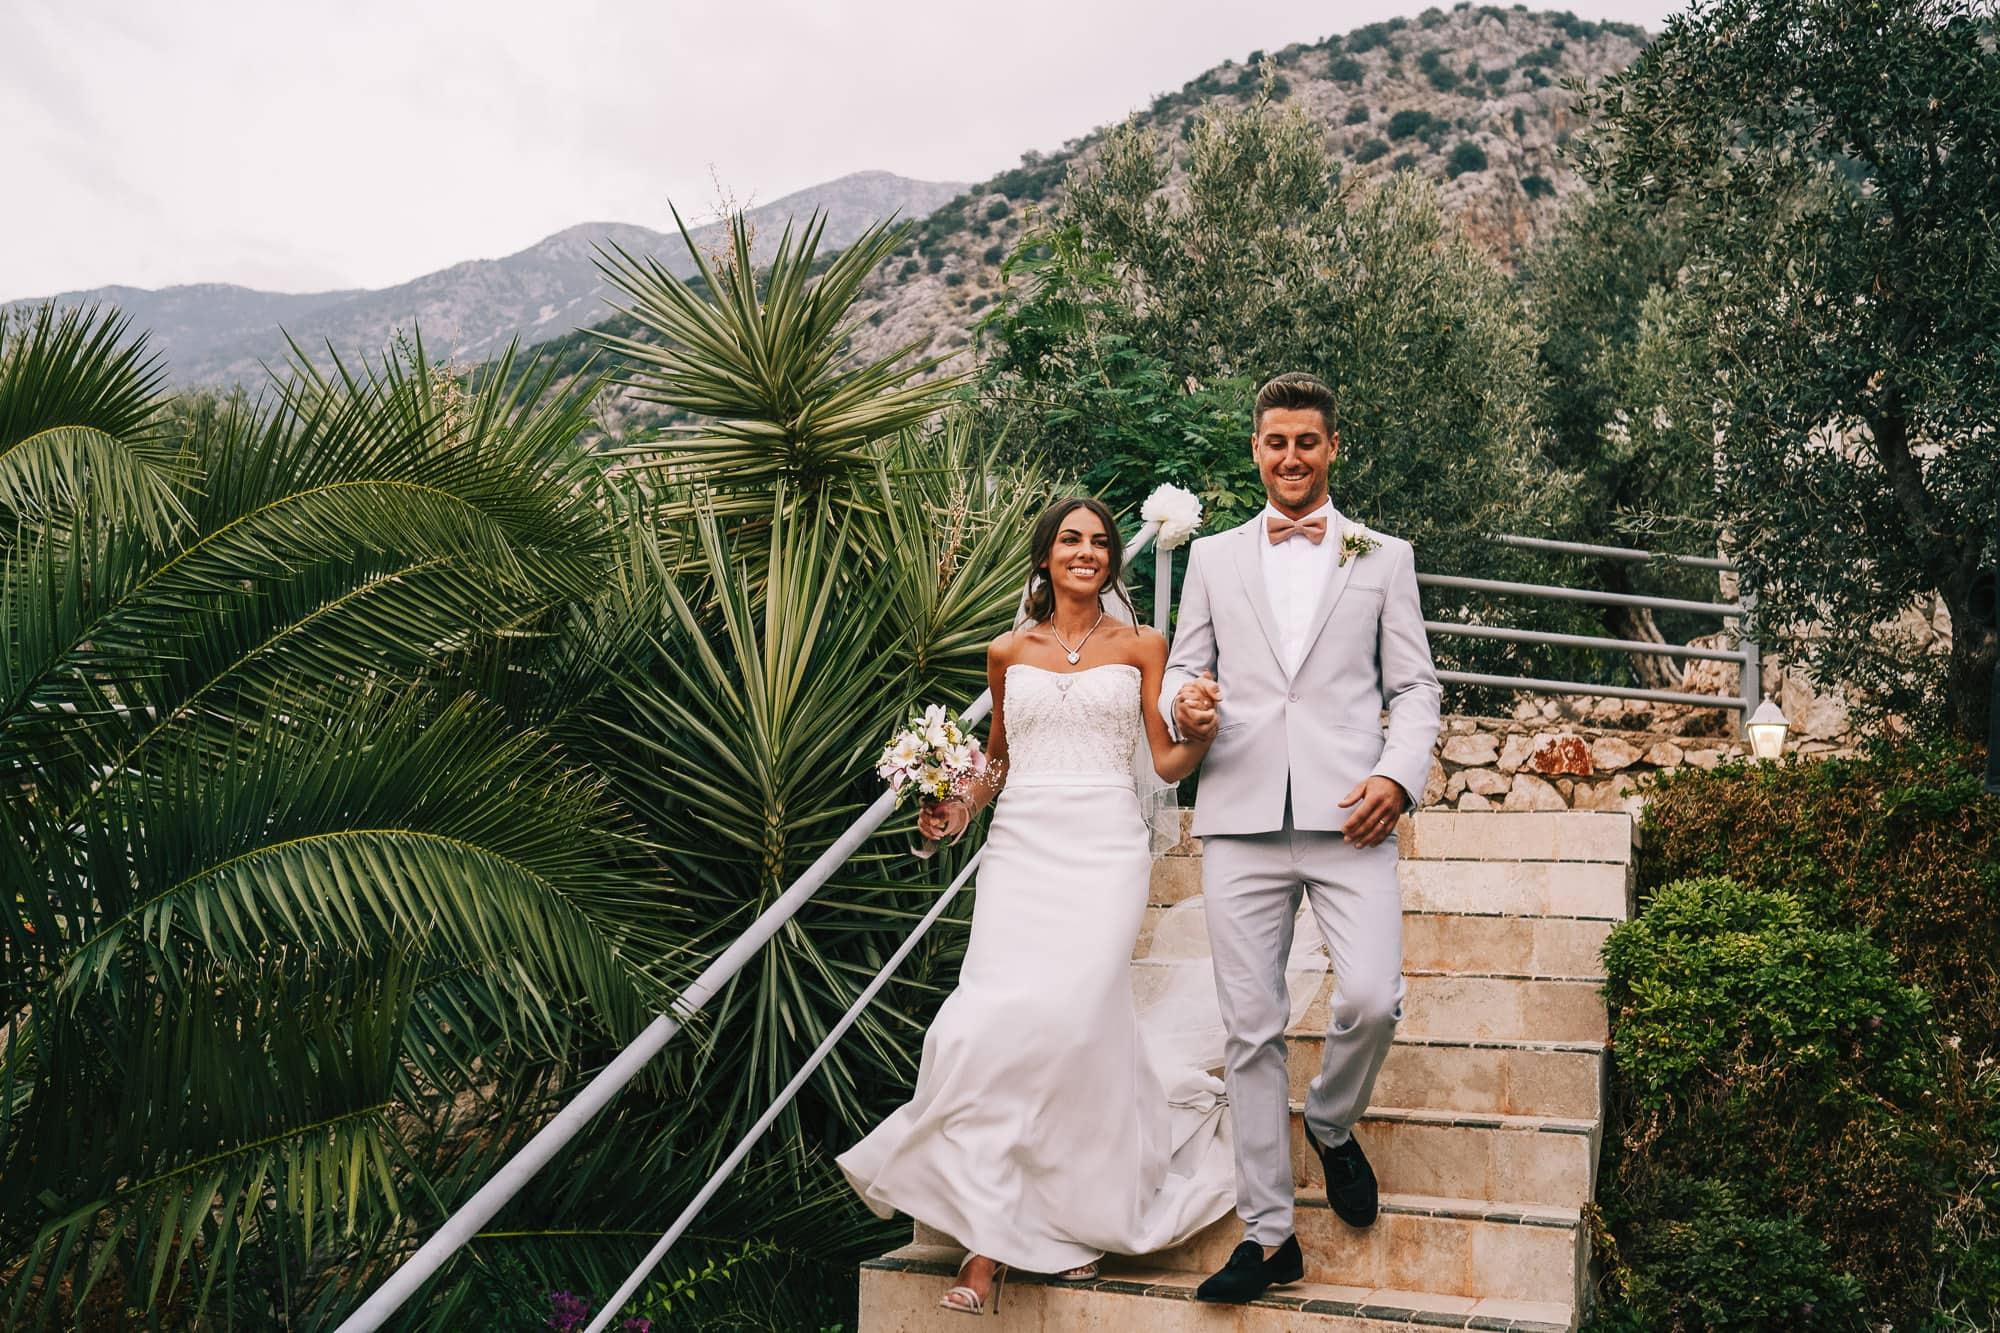 Bride and groom walking to the reception in Villa Mavi Koy in Kalkan